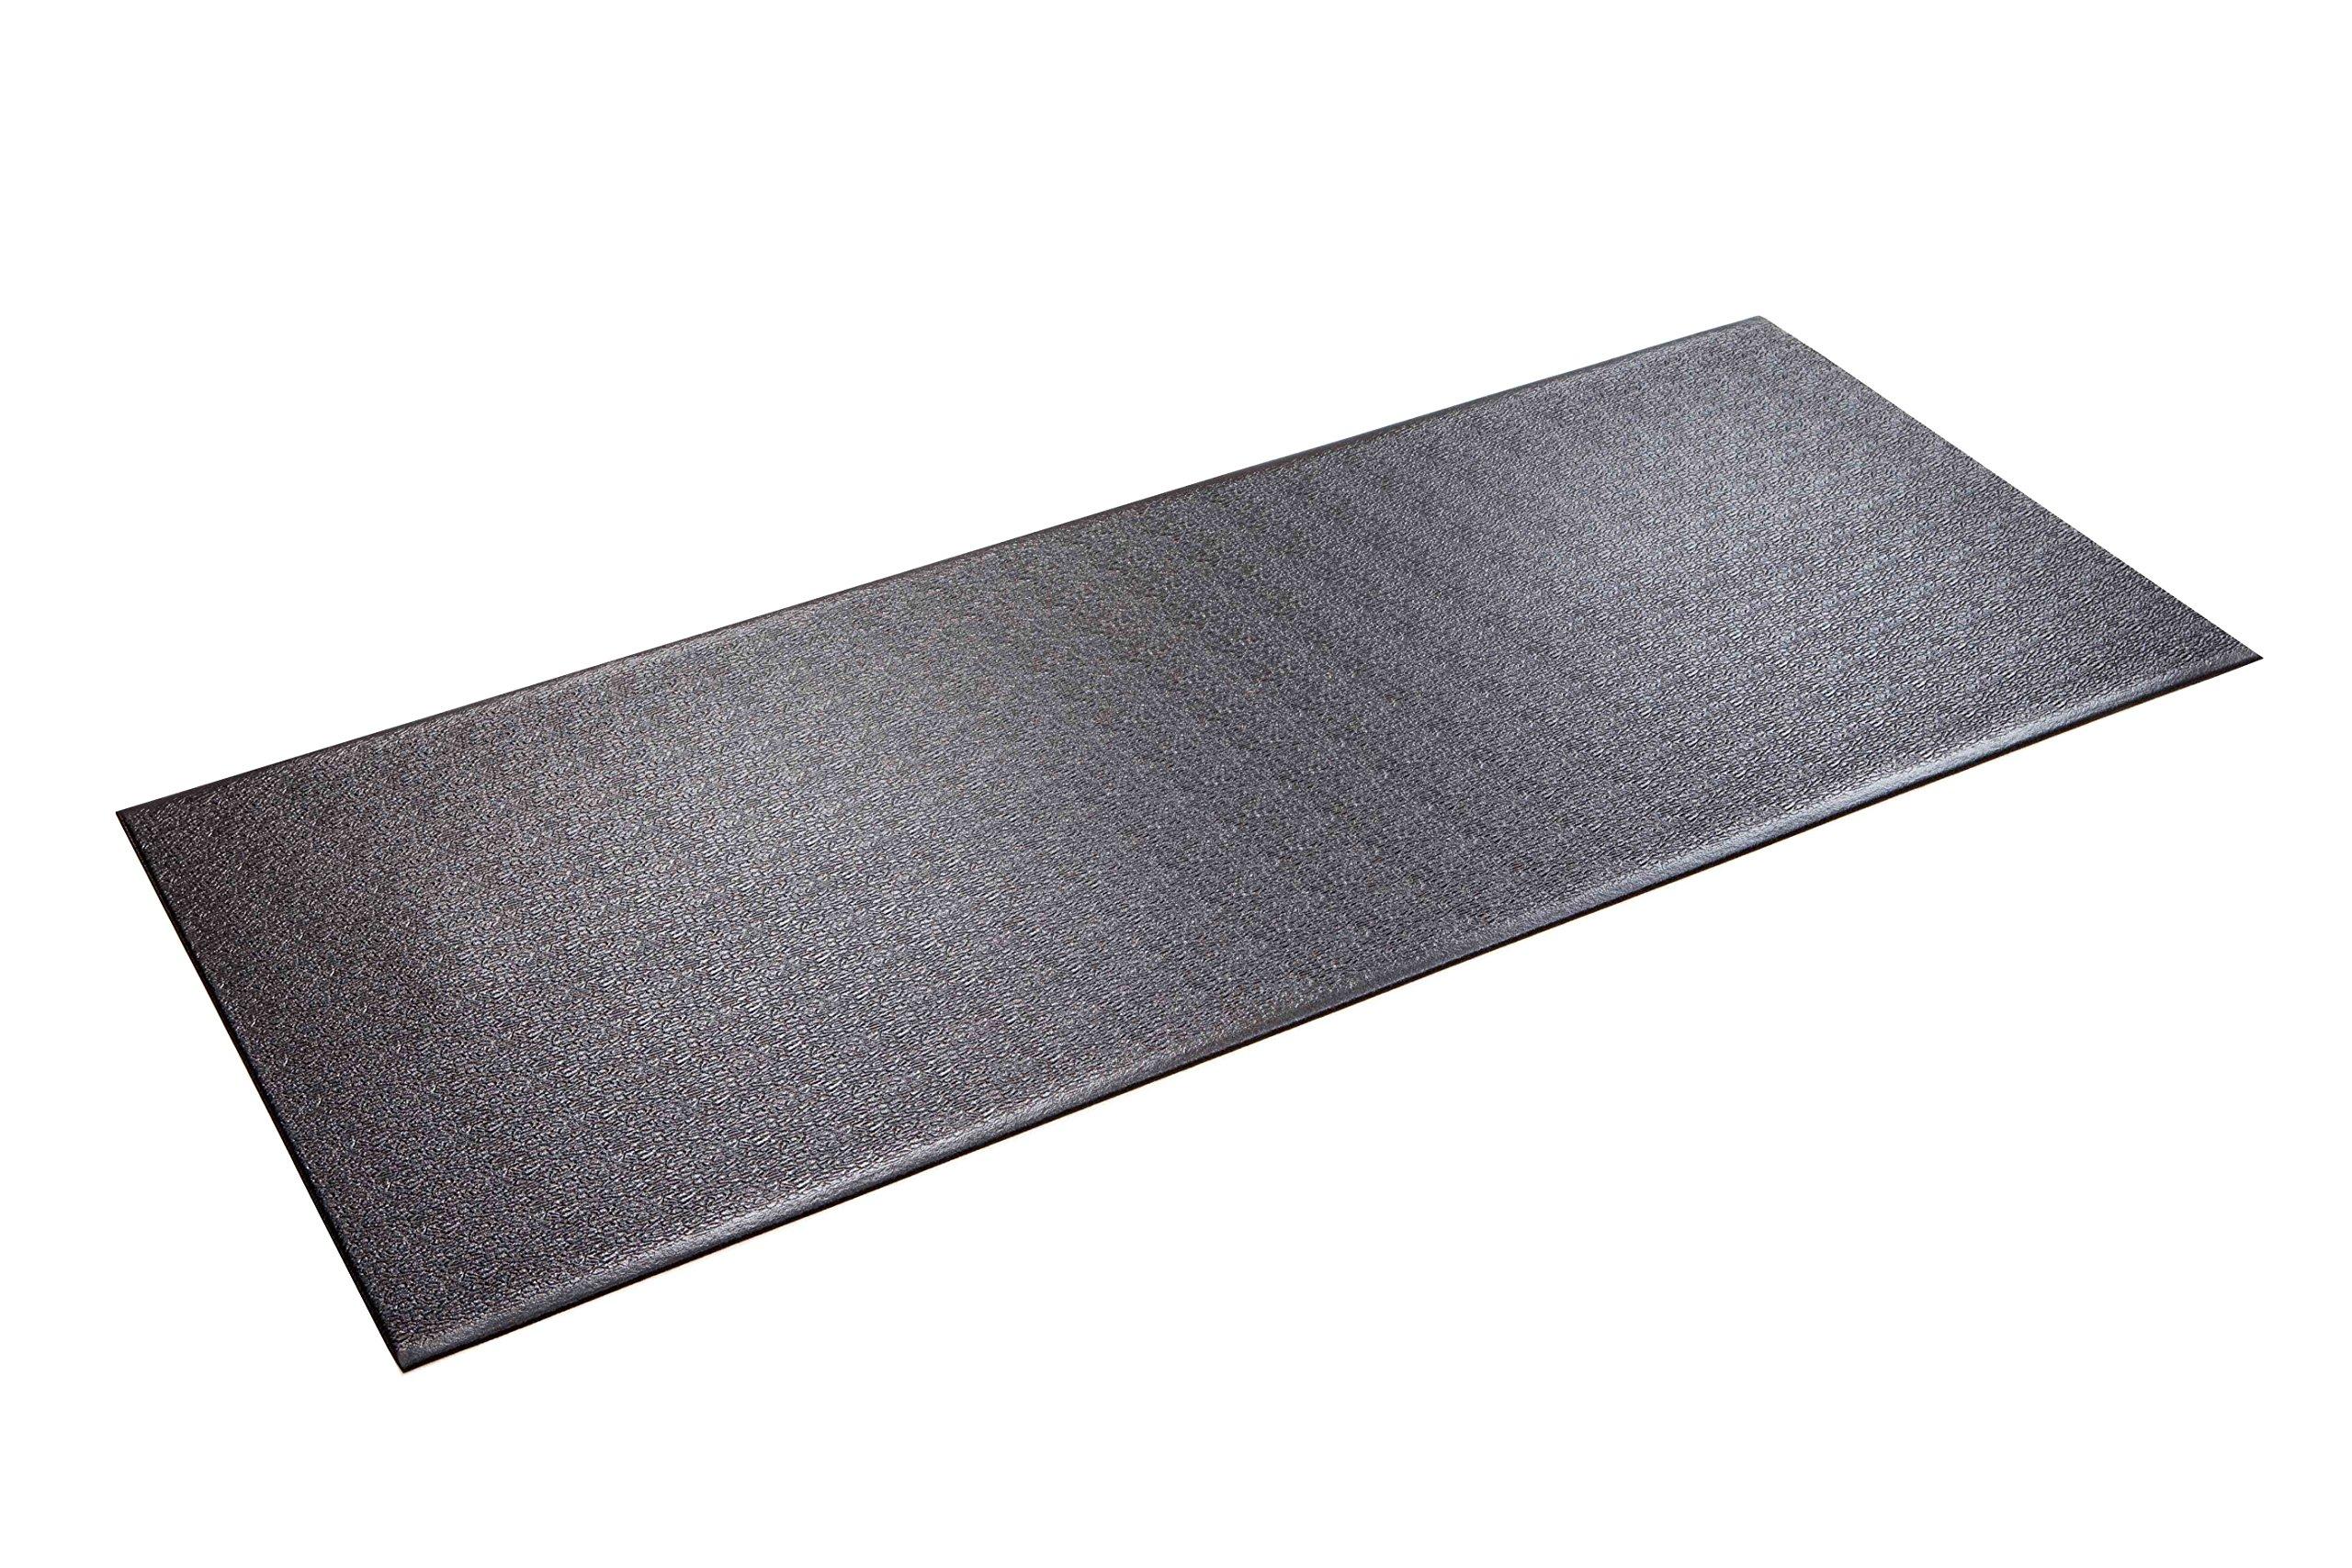 Heavy Duty Supermats Pvc 2 5 X 6 Feet Gym Exercise Treadmill Mat Ski Machine Ebay